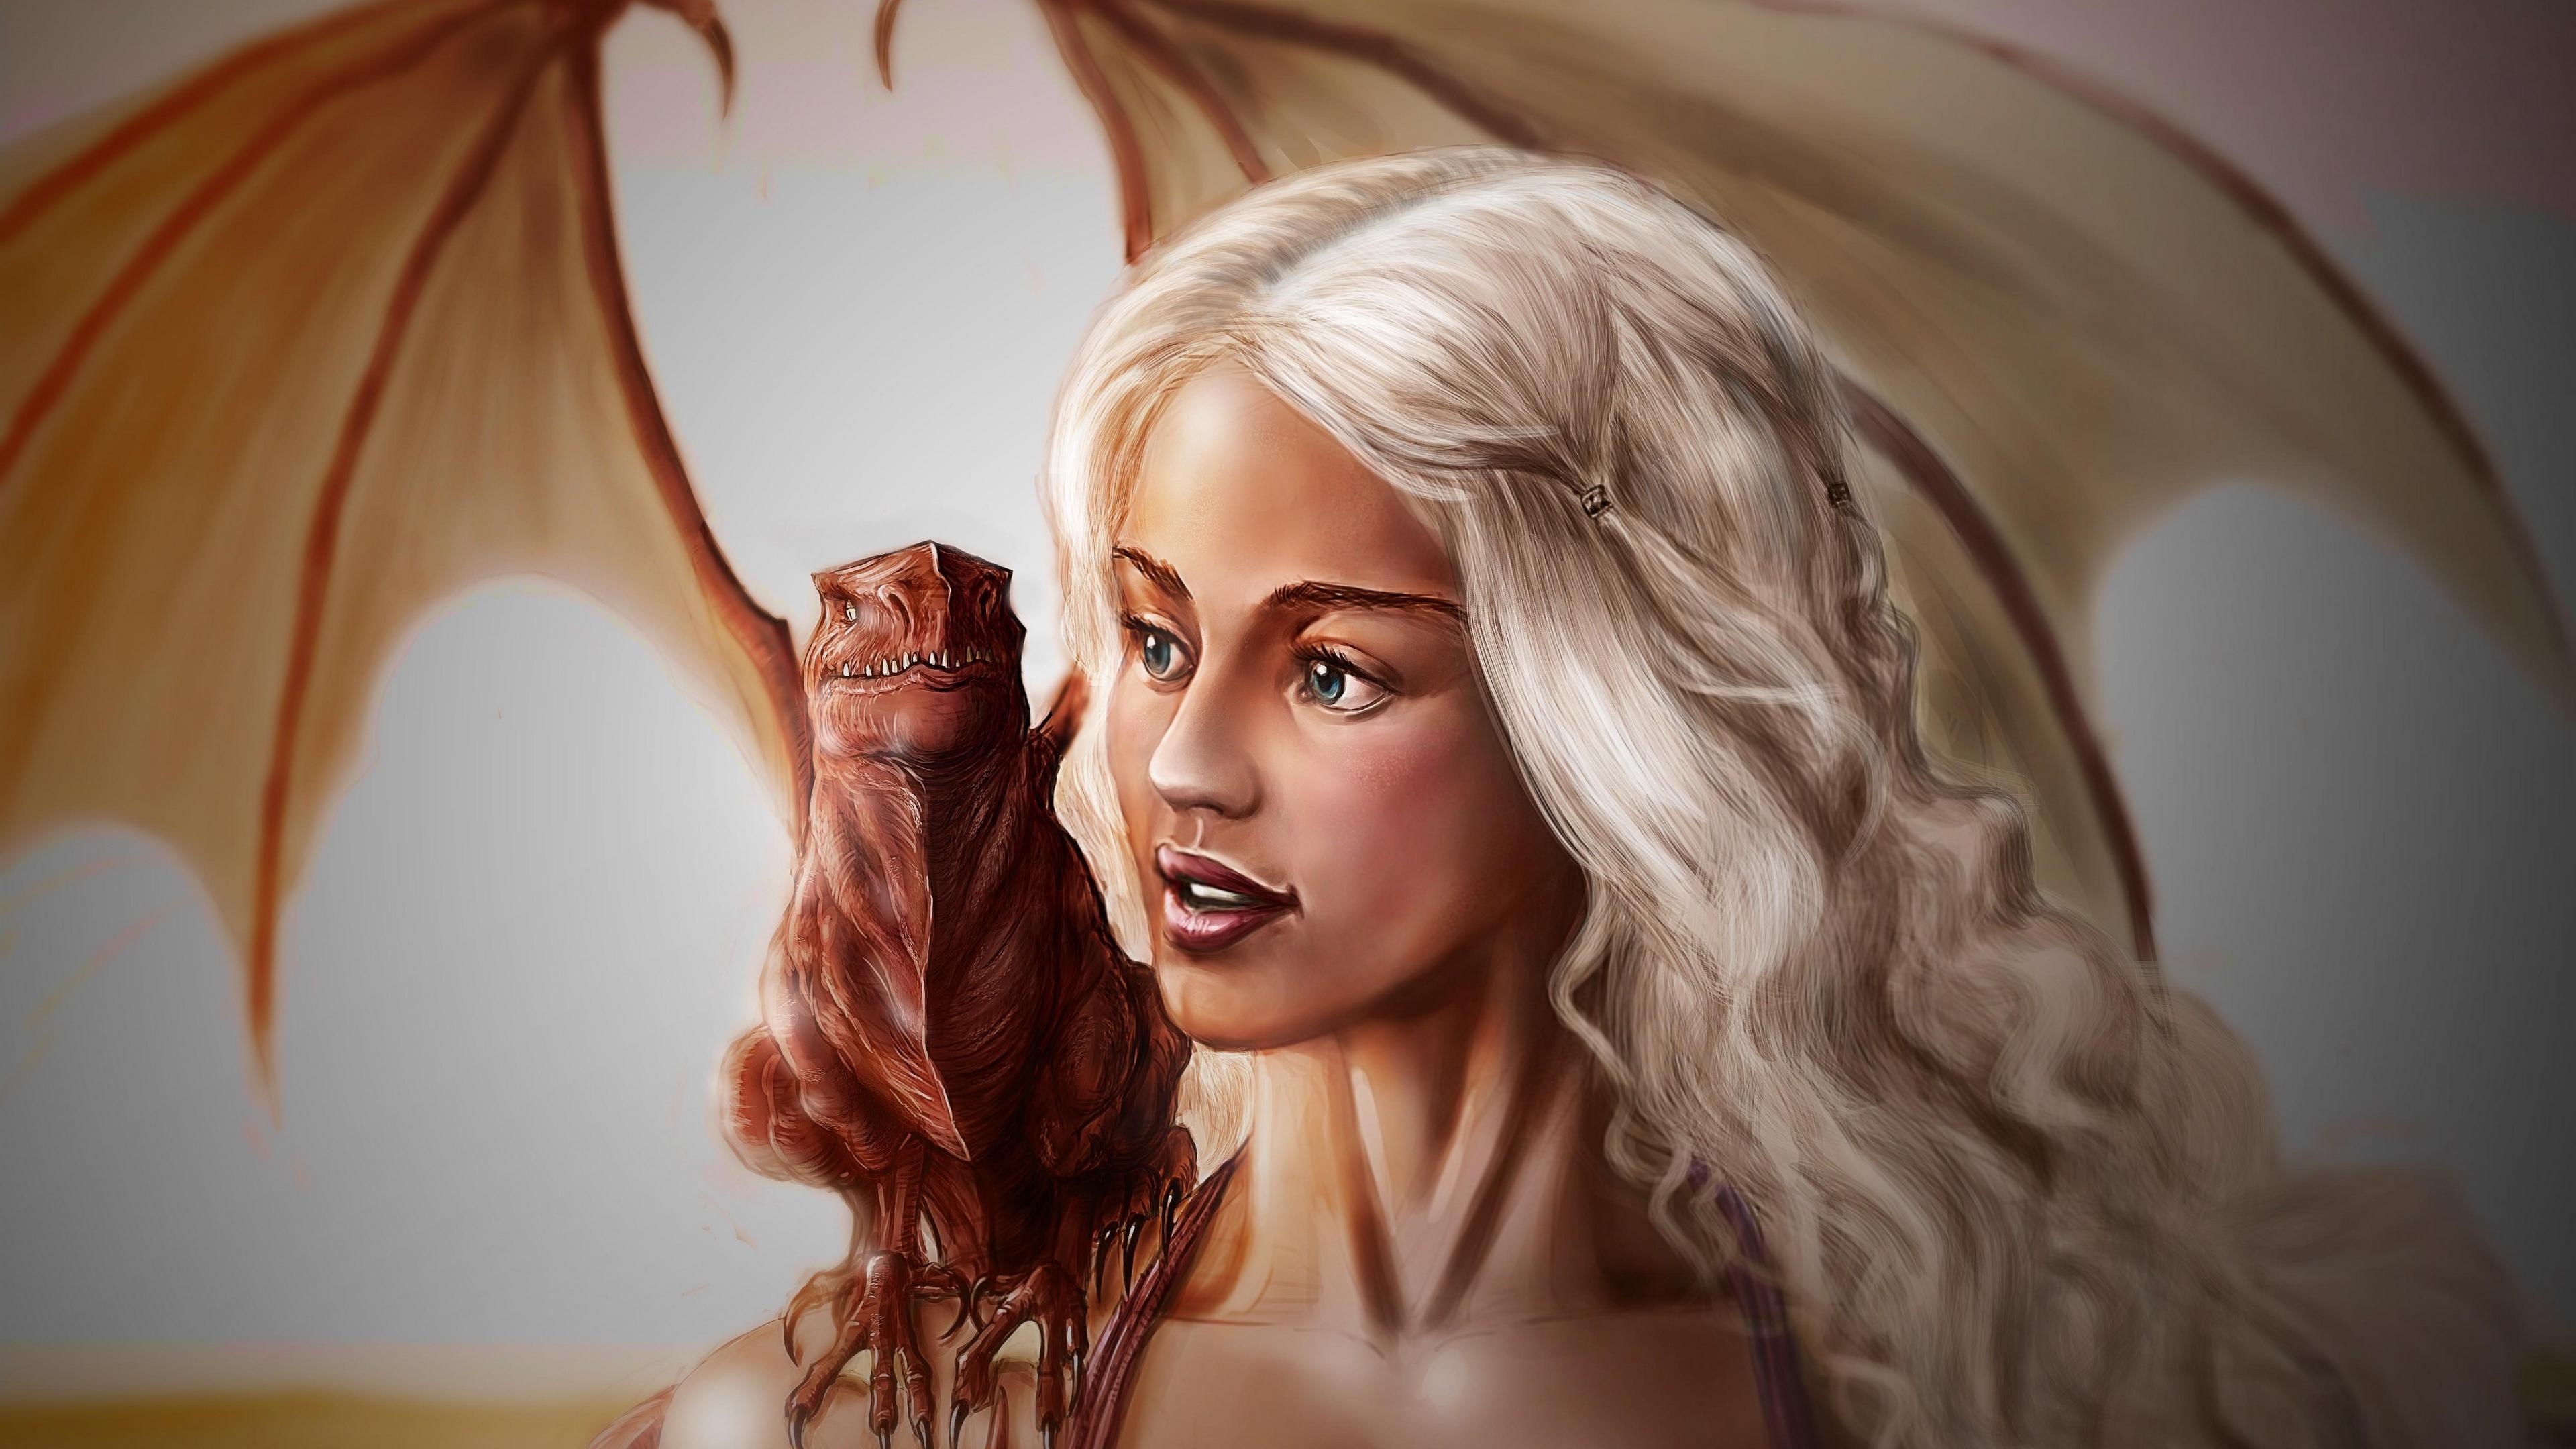 girl blonde shoulder creature claws wings 4k 1536098115 - girl, blonde, shoulder, creature, claws, wings 4k - shoulder, Girl, Blonde